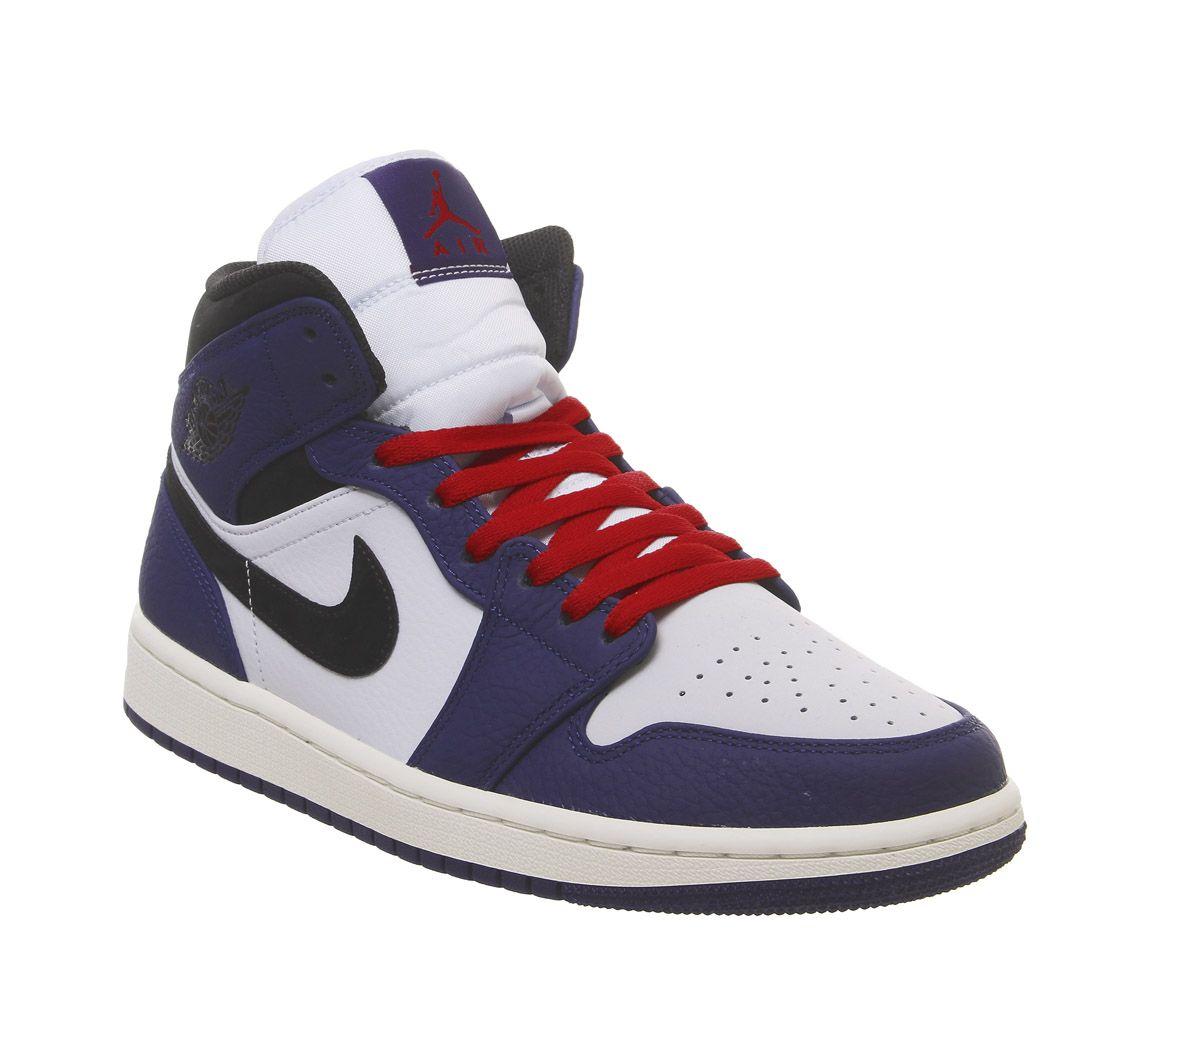 online retailer f8b9c 0f343 Air Jordan 1 Mid Trainers